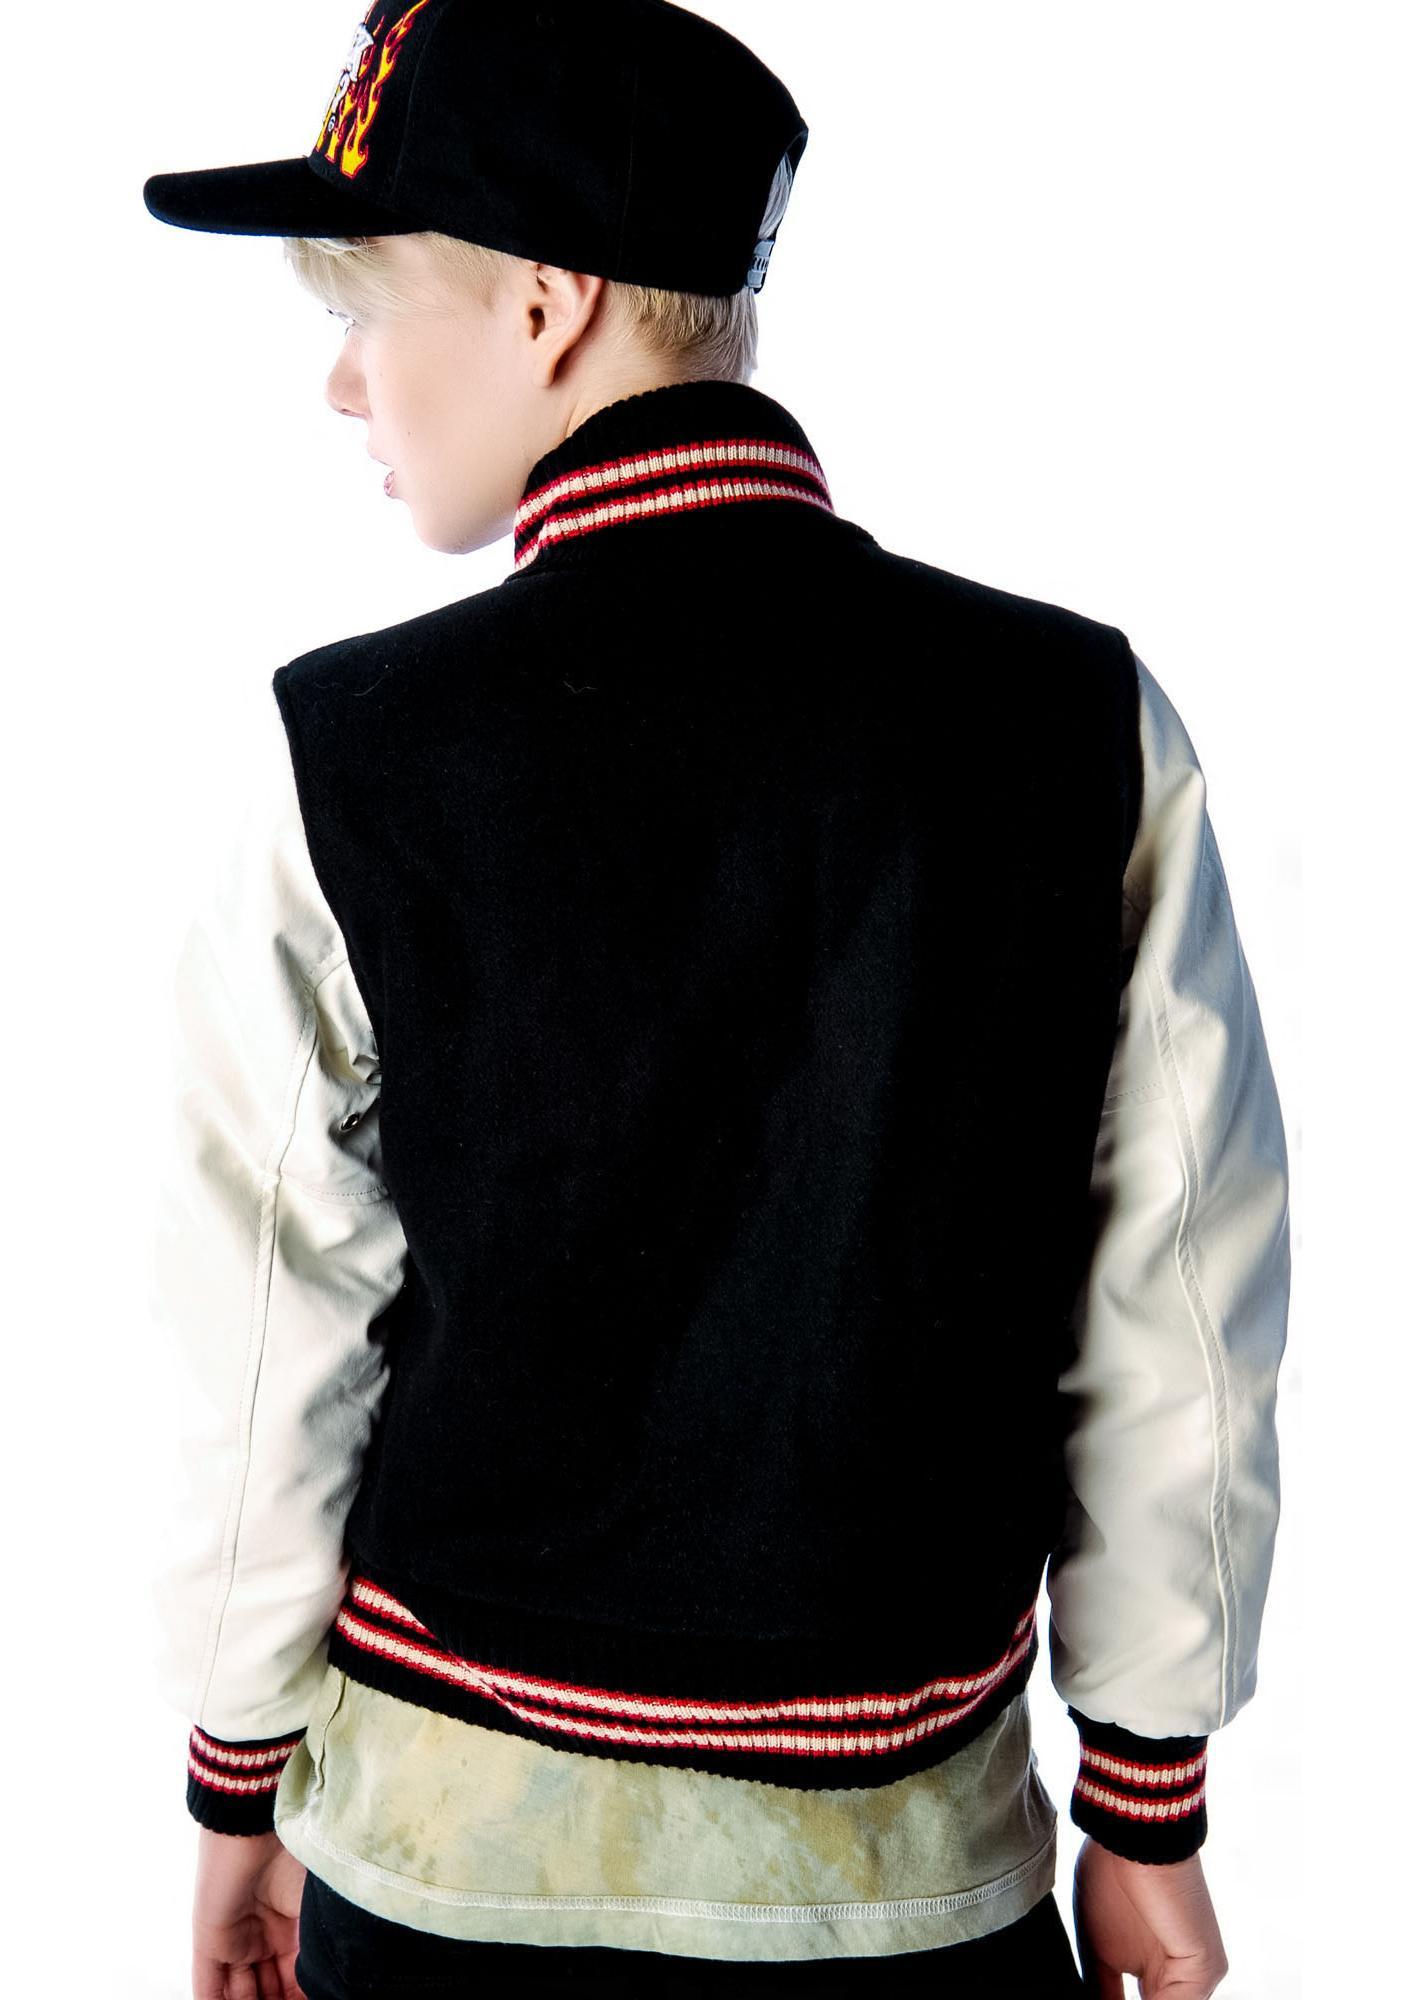 UNIF Drop Out Jacket